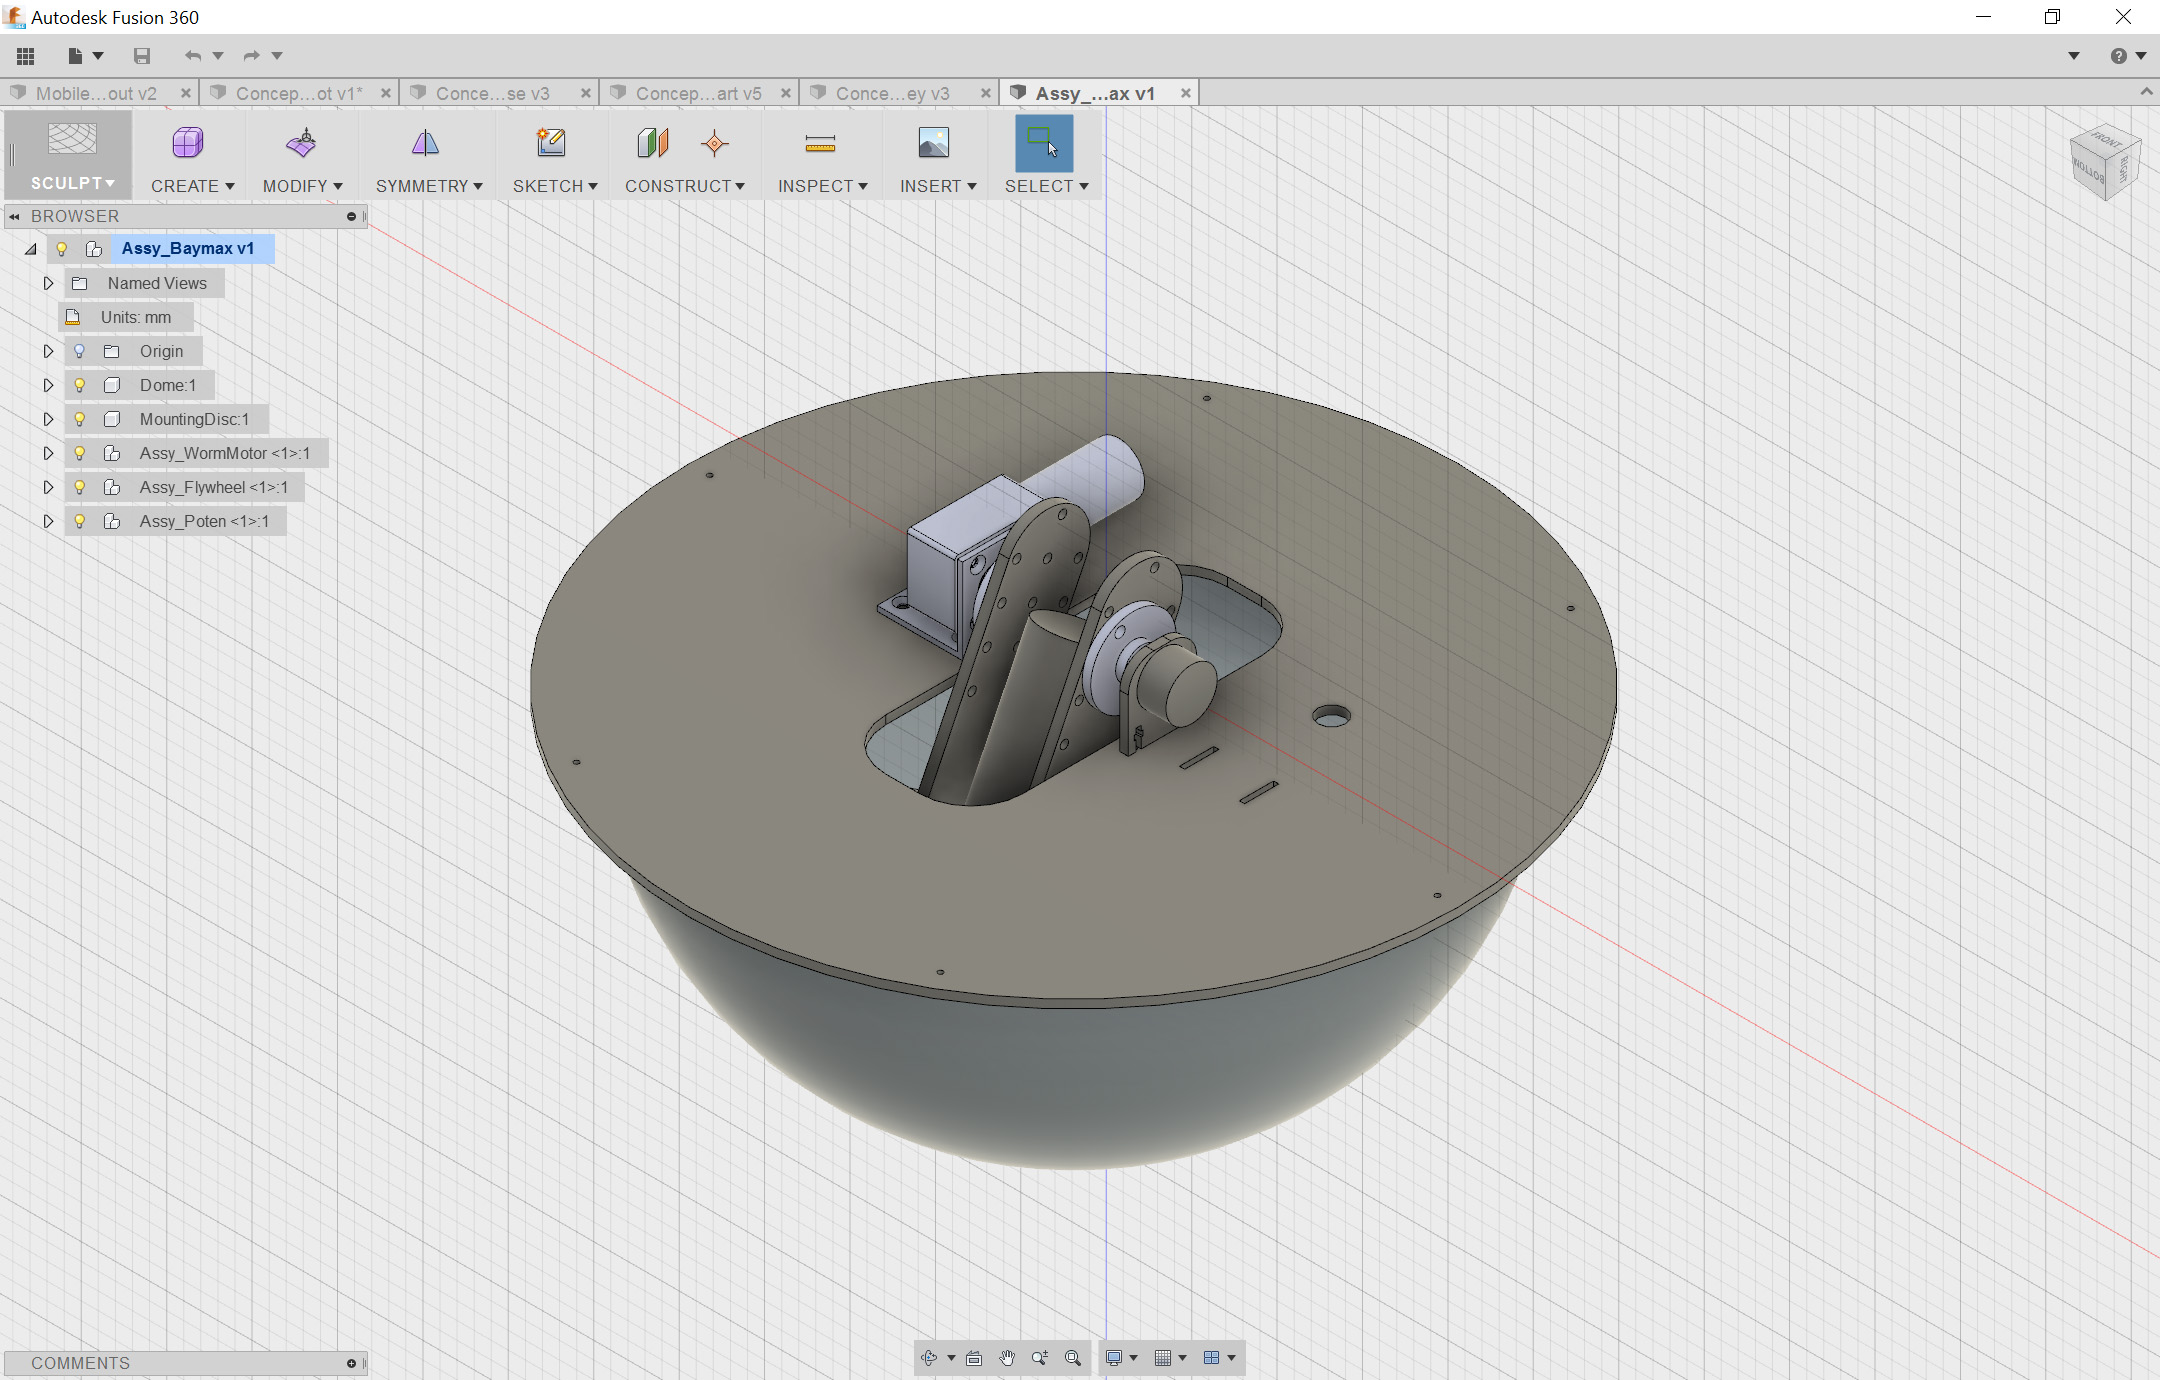 CAD ฟรี ดี ๆ ใครว่าไม่มีในโลก – ThaiRobotics